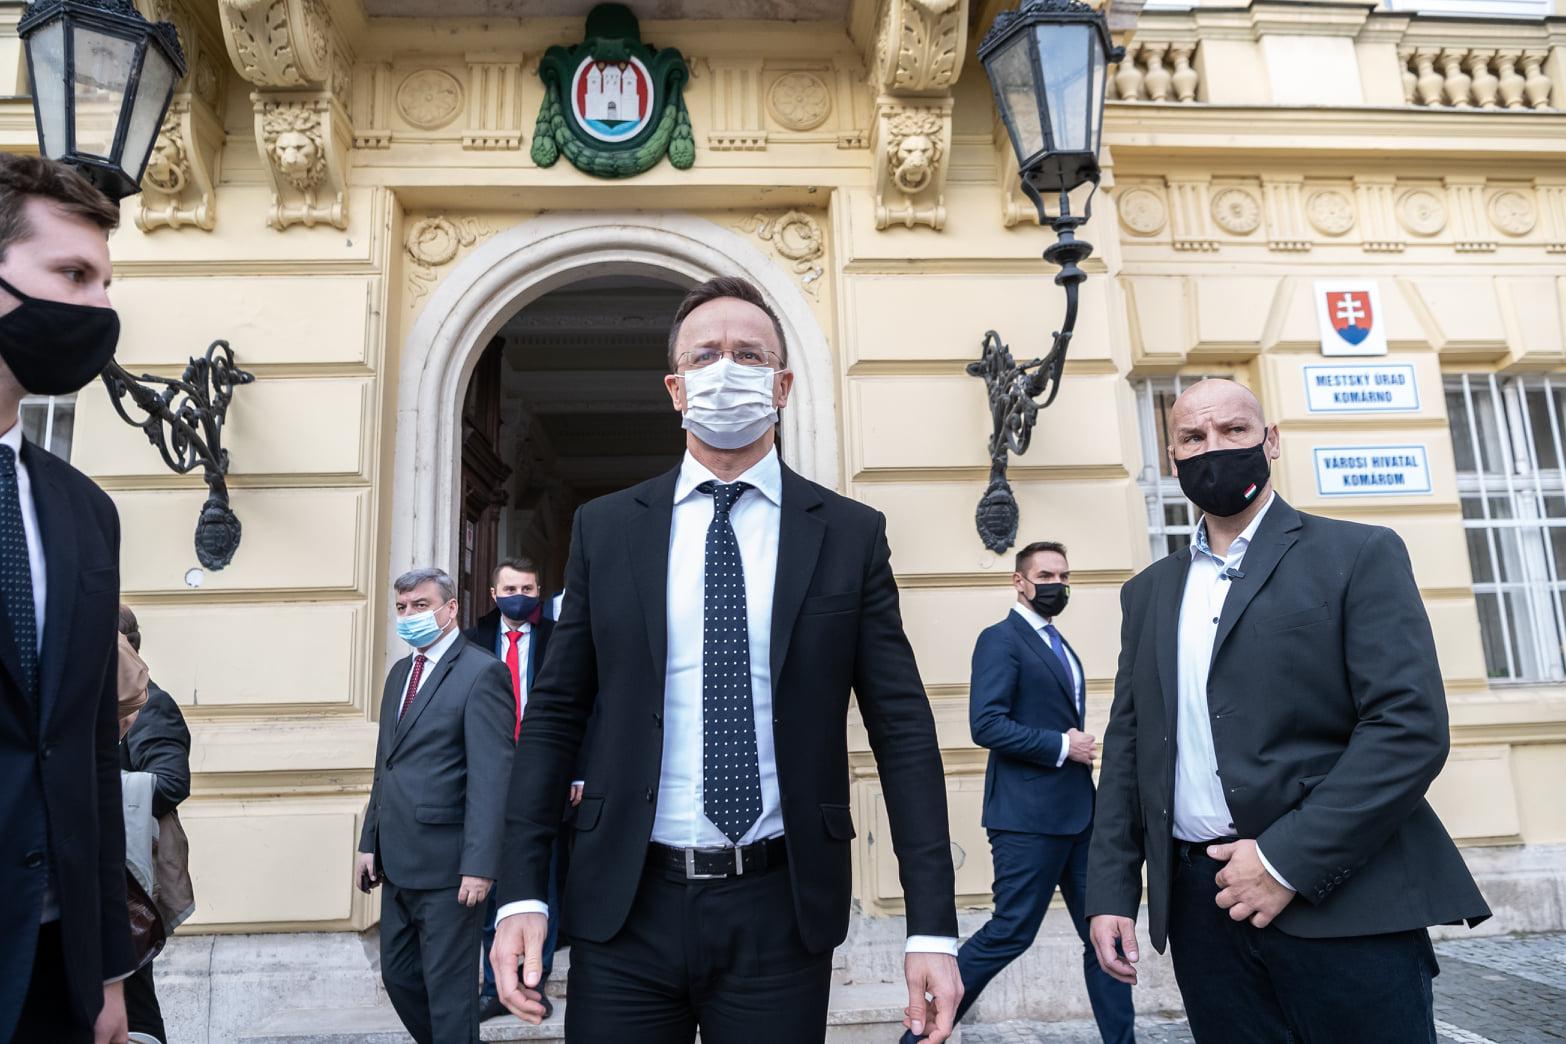 FM Szijjártó in Slovakia: 'Dual Citizenship Should Not Be Feared'